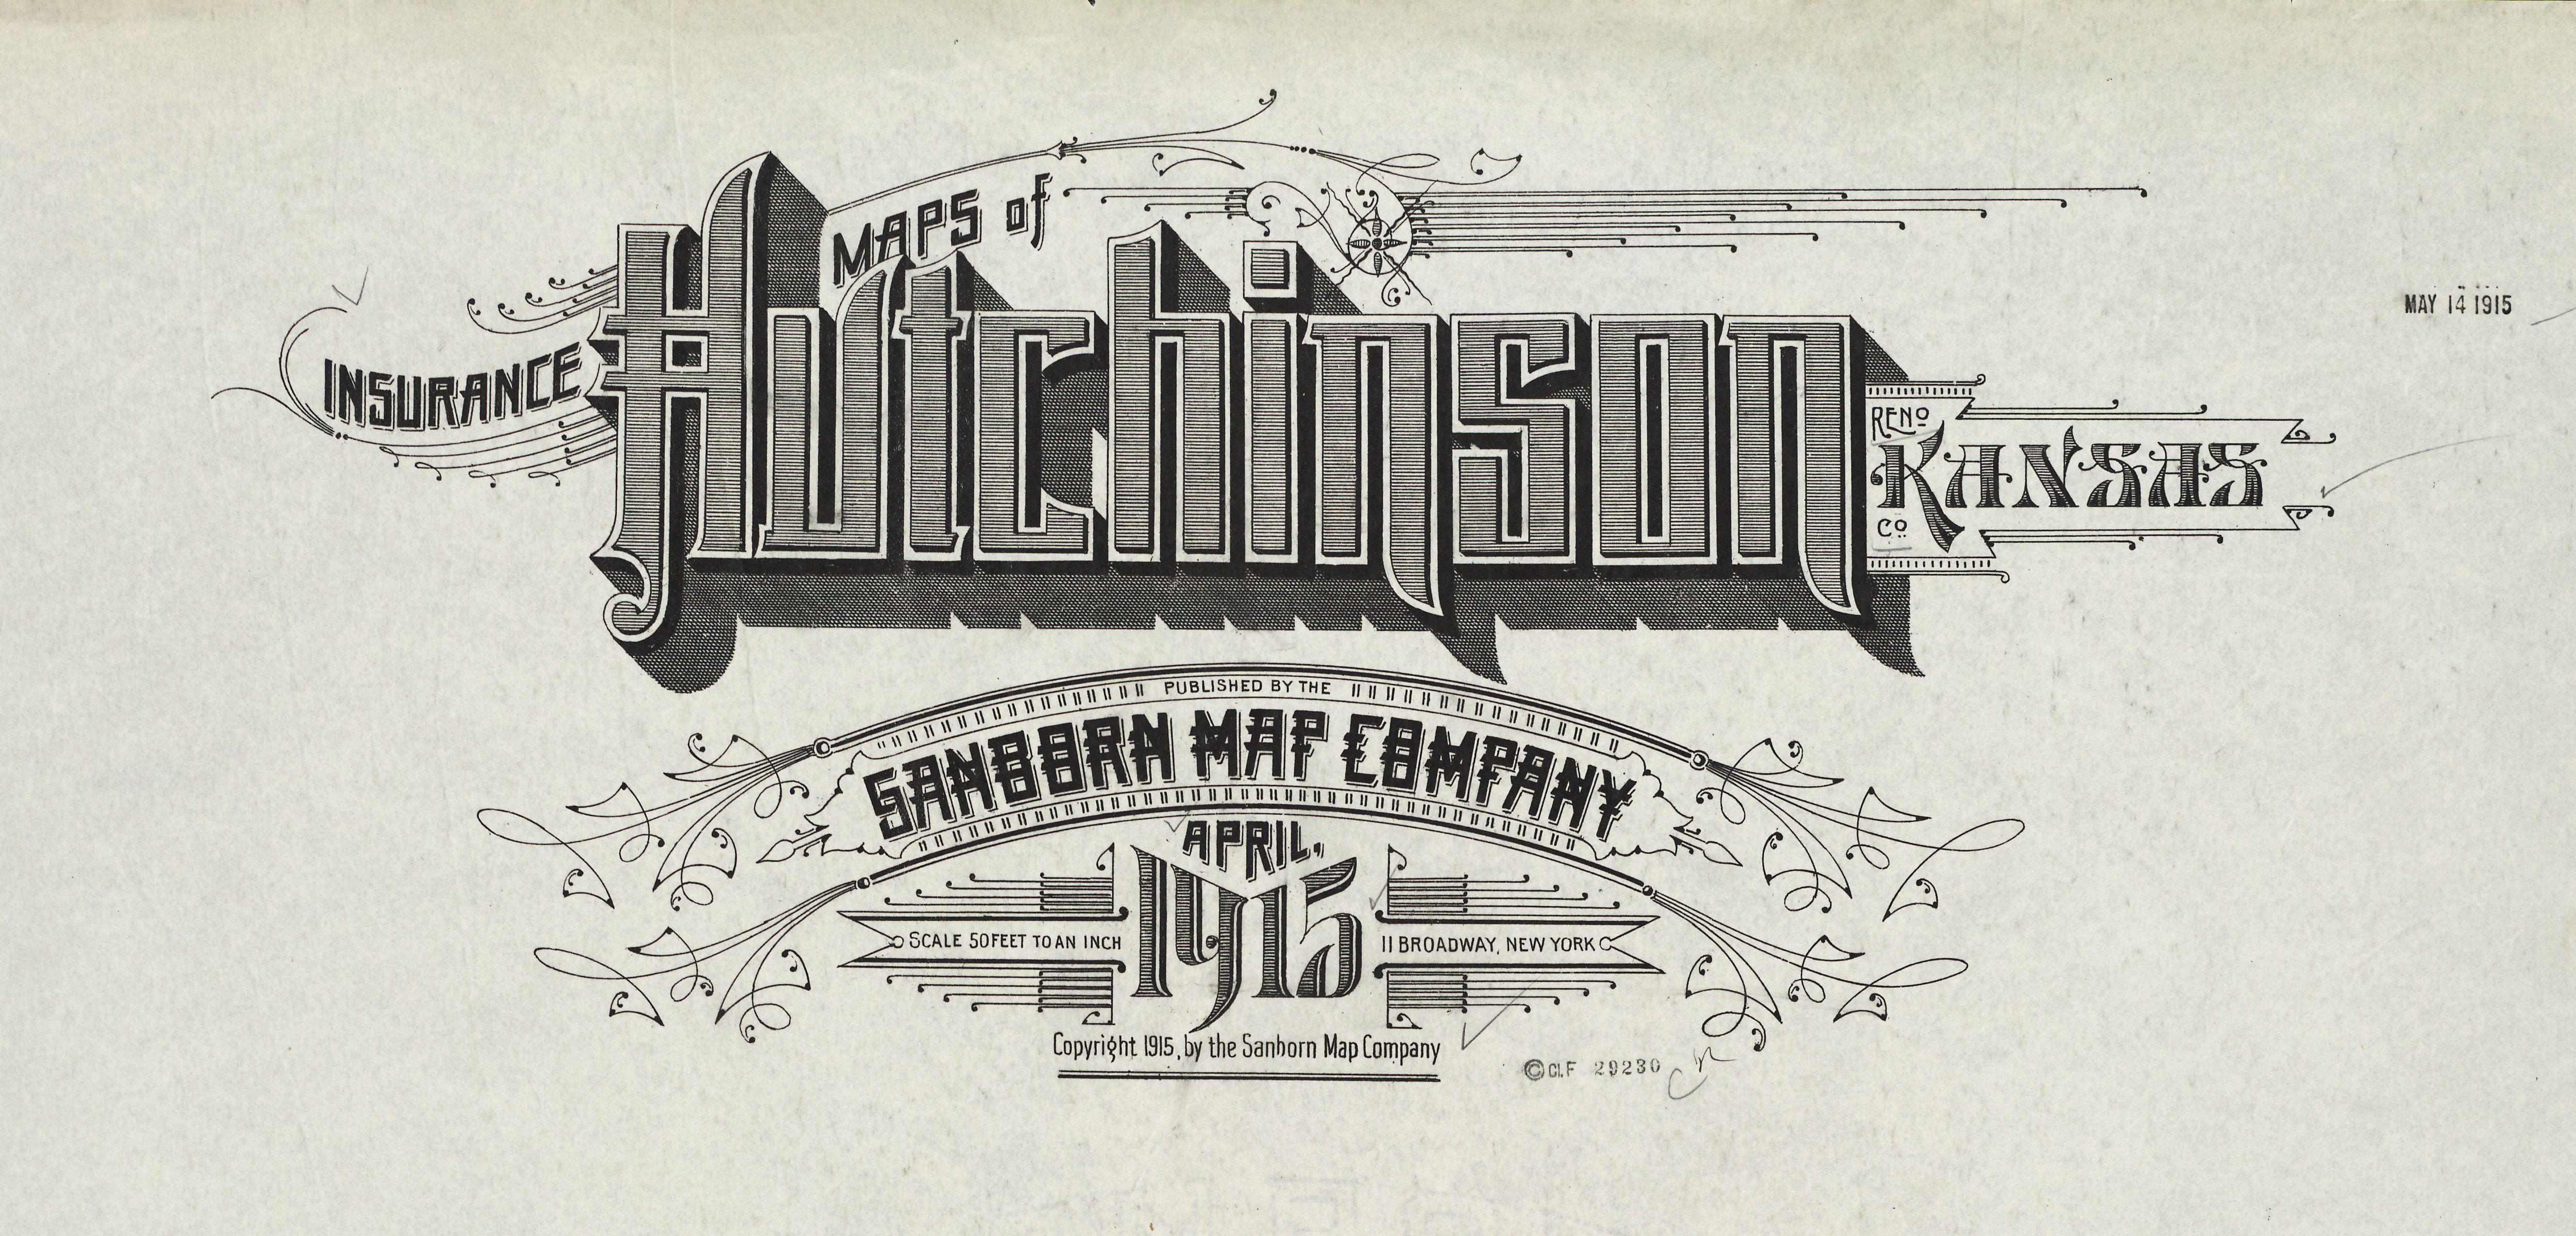 Sanborn Insurance Map Kansas Hutchinson 1915 Detail With